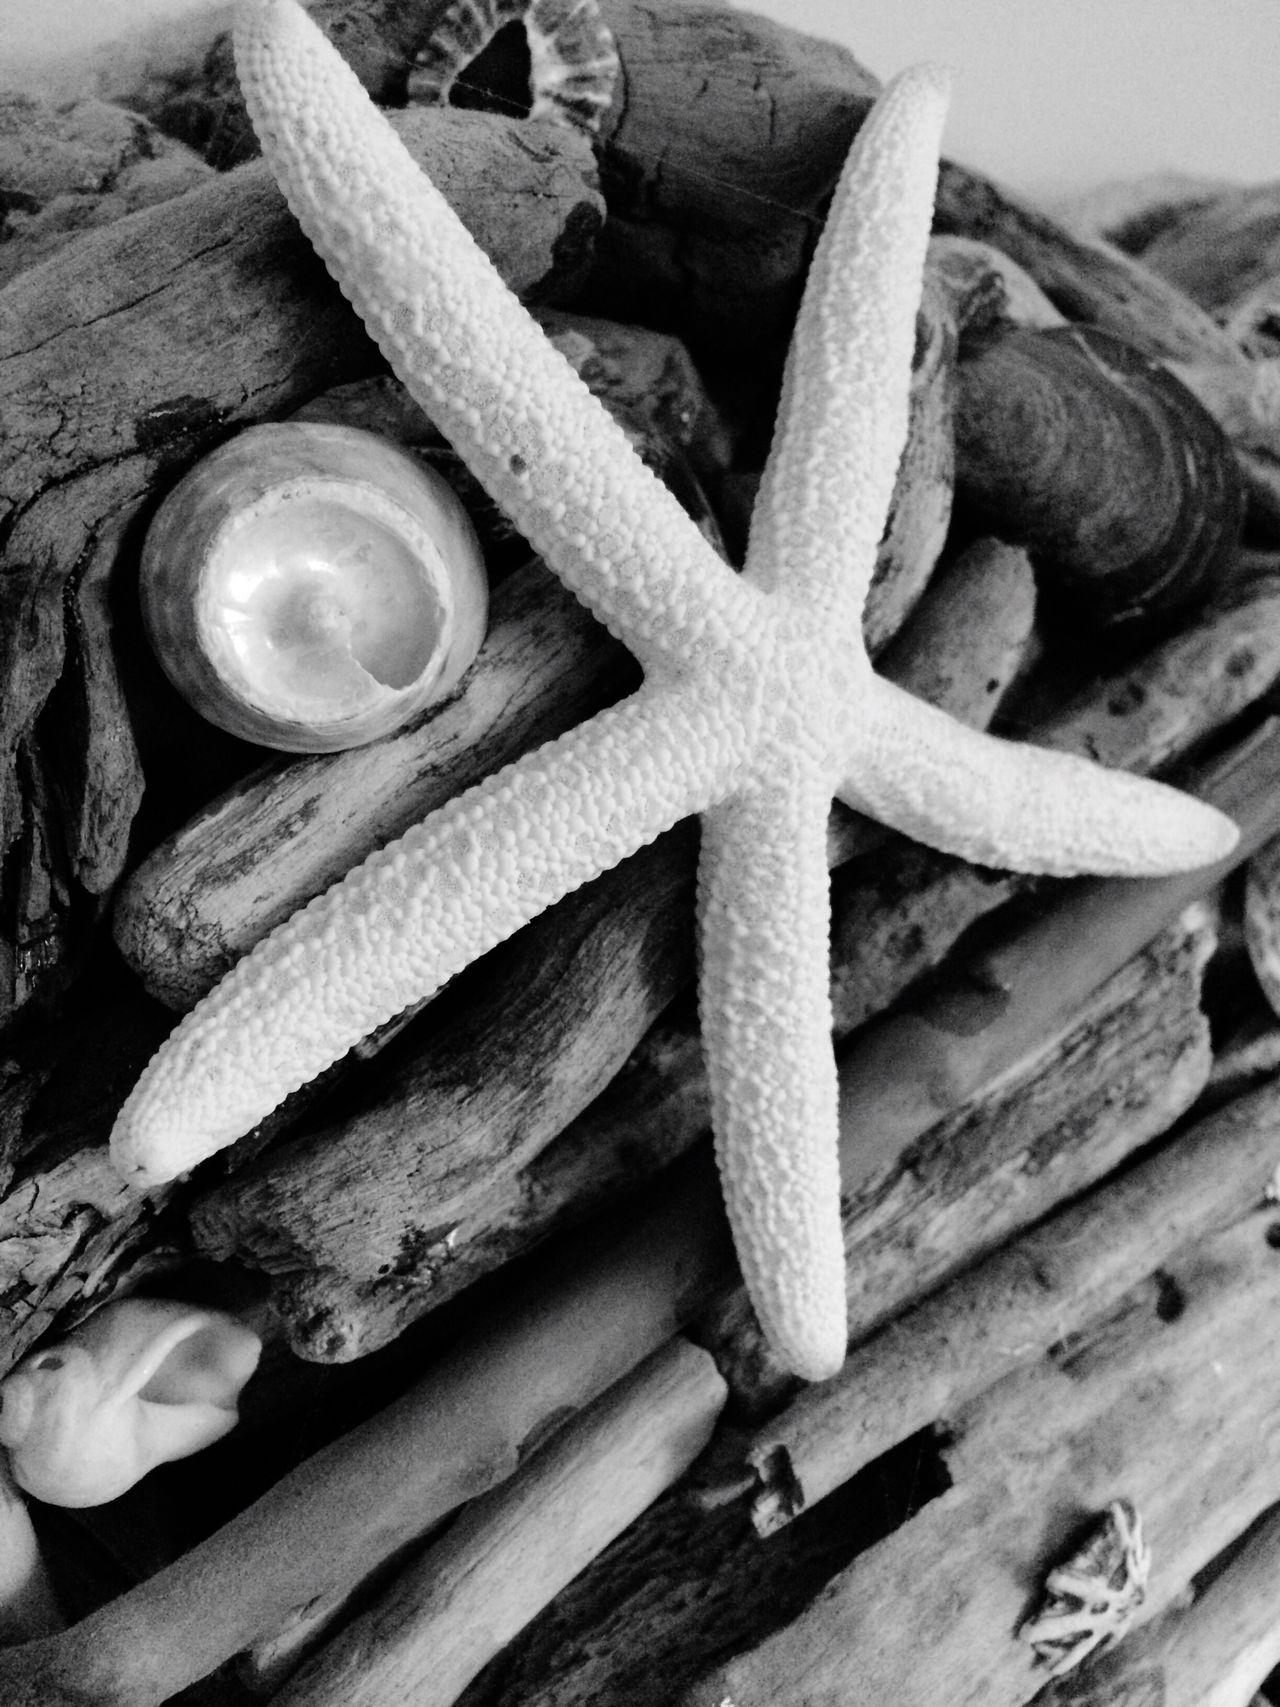 Star a drift Starfish  Driftwood Close-up No People Indoors  Day Freshness Sea Seaside Driftwood Art Starfish At Beach Nature